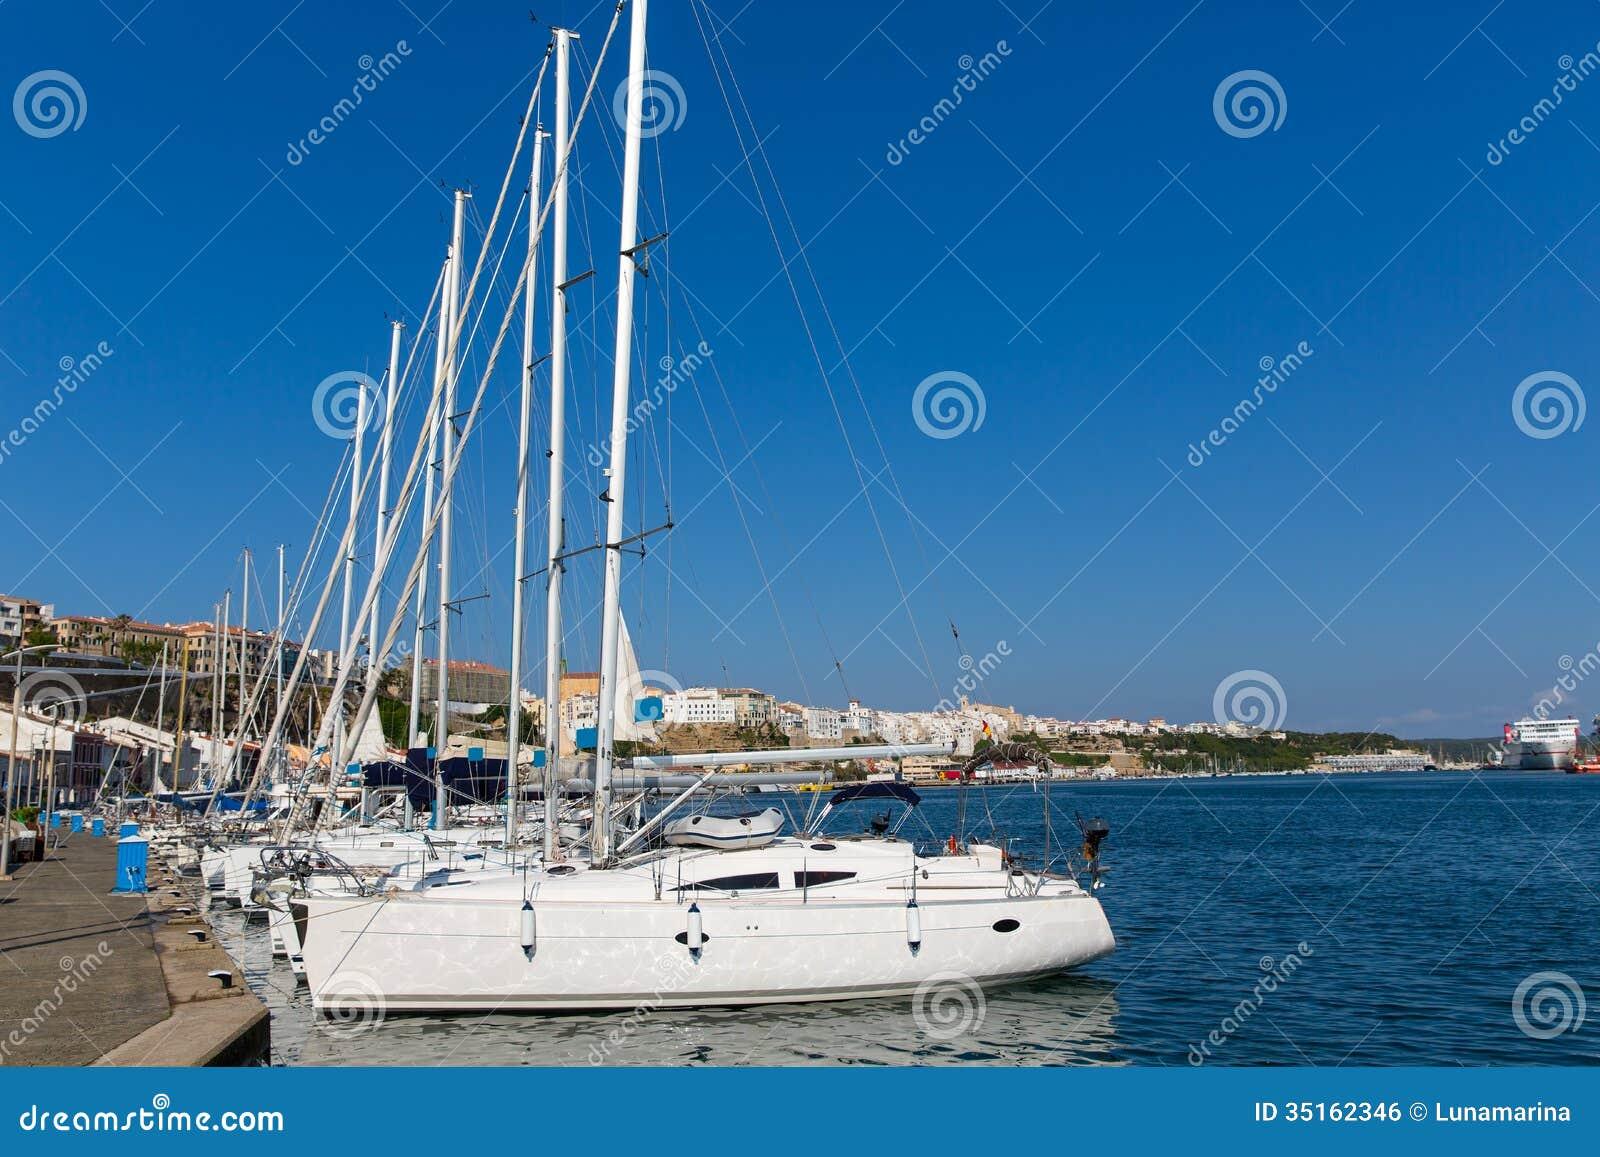 Mao Port Of Mahon In Menorca At Balearic Islands Royalty Free Stock Image - I...